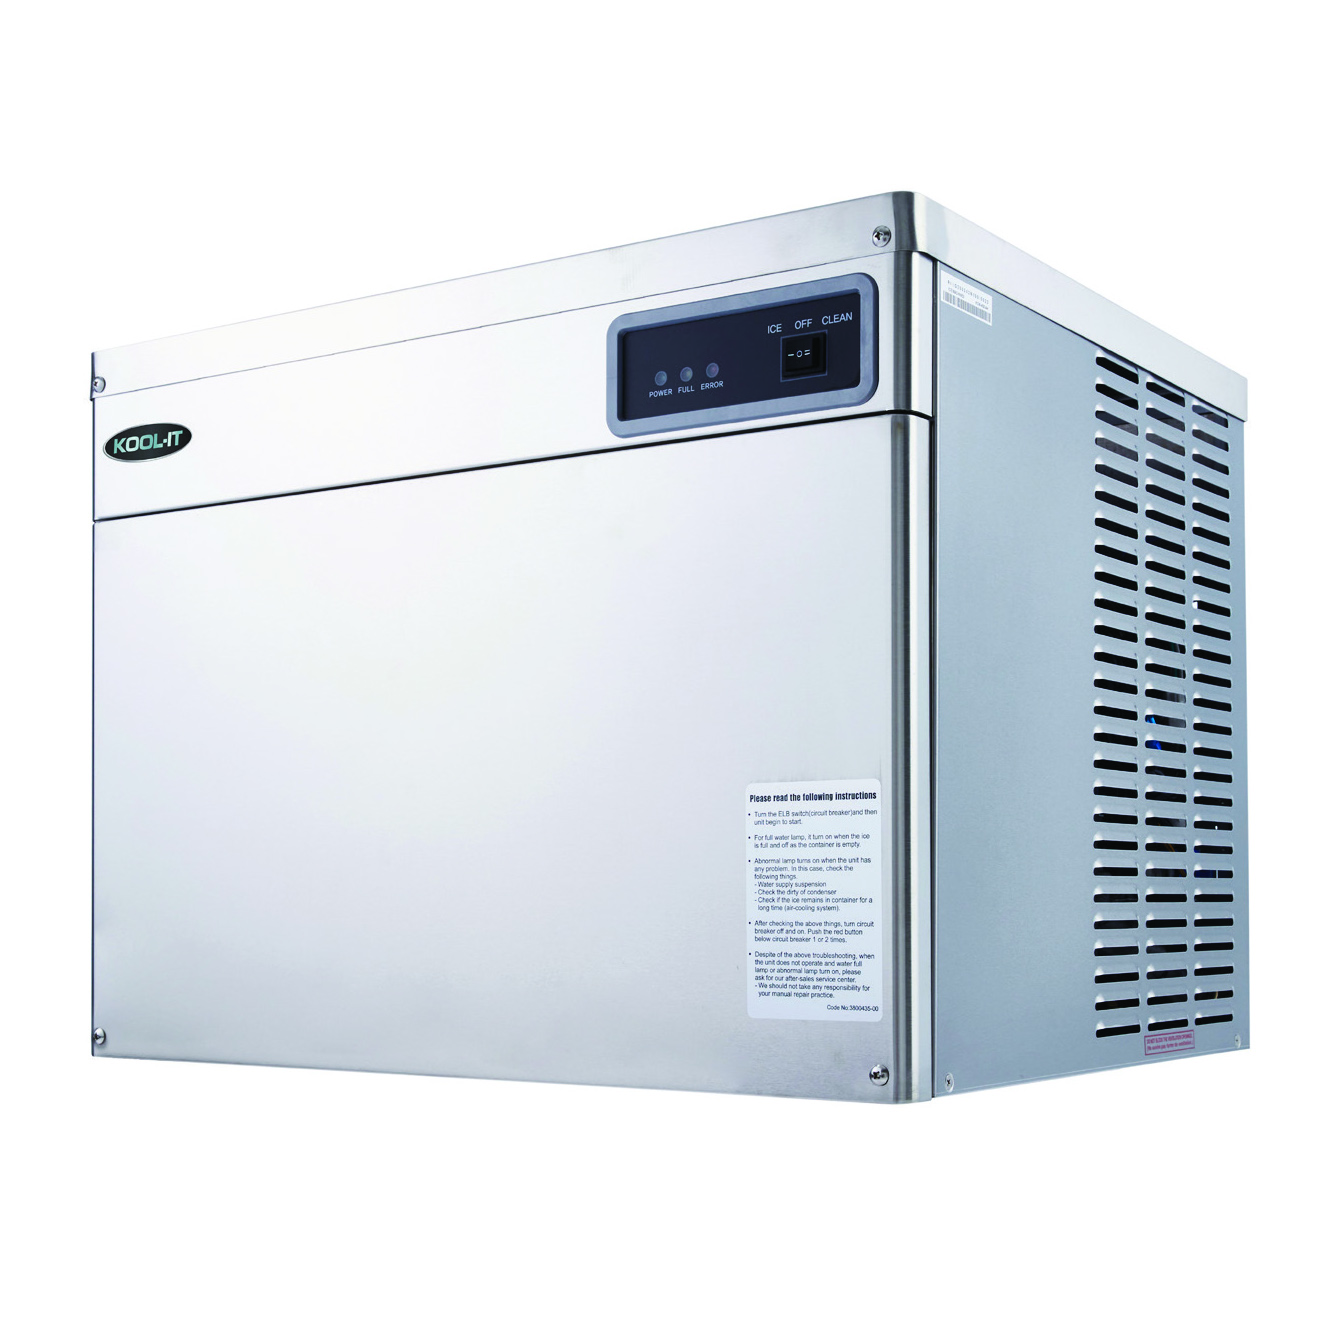 MVP Group LLC KCM-670-AH ice cubers, ice storage & ice dispensers